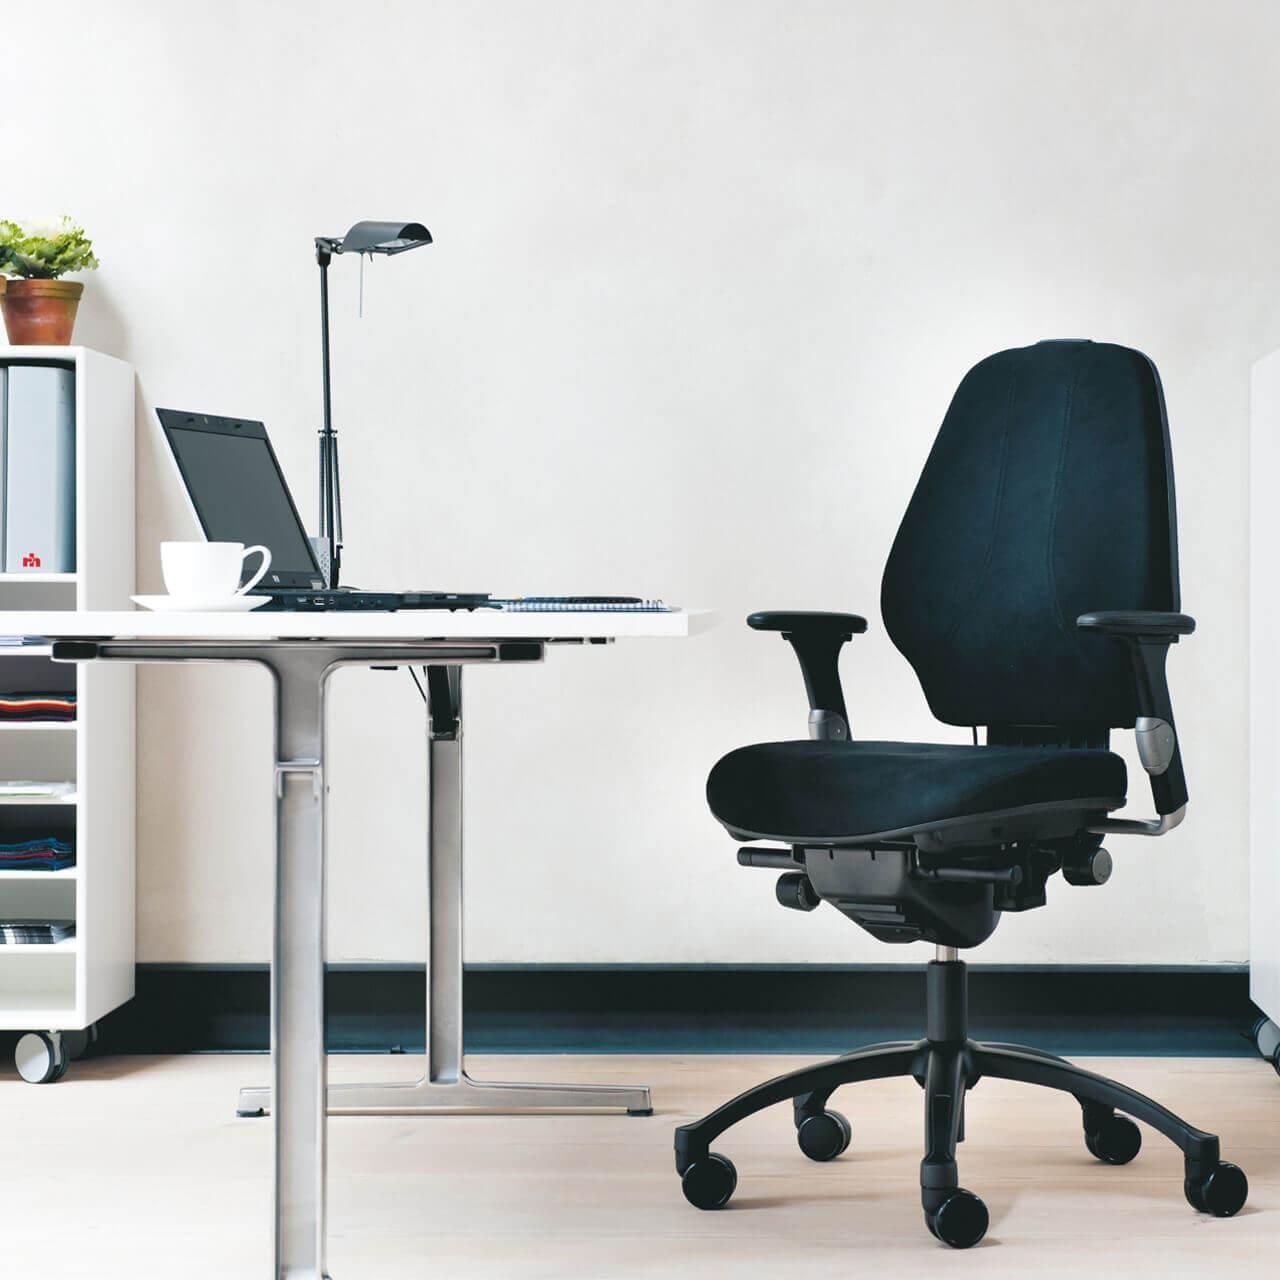 Rh logic 300 xl bureaustoel STKALOG303 0006 Omgeving